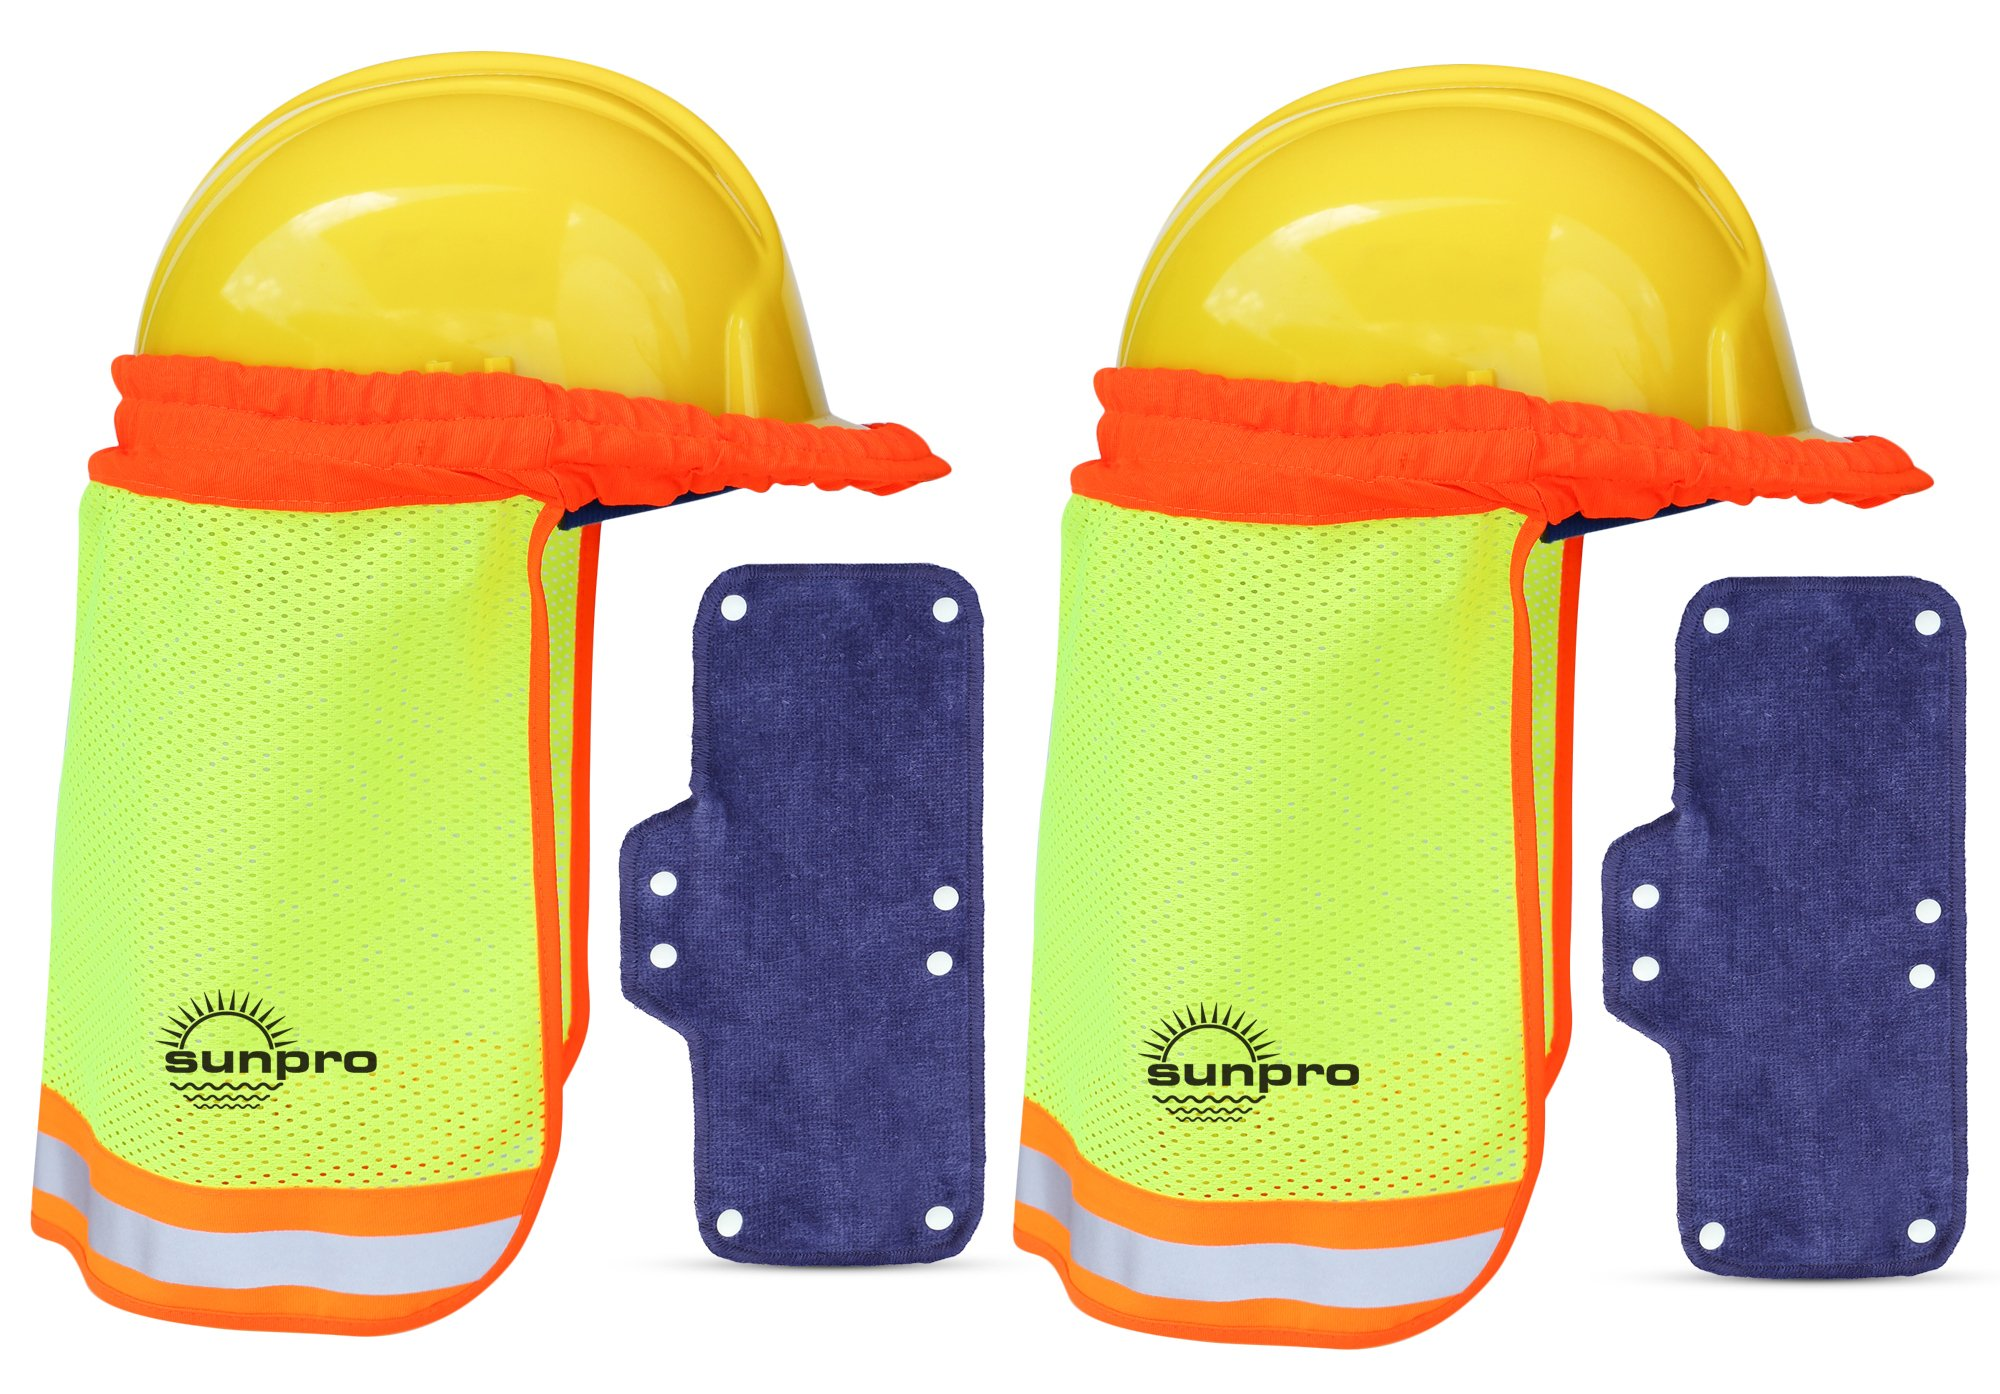 8d30605caa2 Galleon - Hard Hat Sun Shade And Sweatband Set    Hardhat Neck Shade Fits  Regular And Full Brim Construction Helmets (2 Pack)